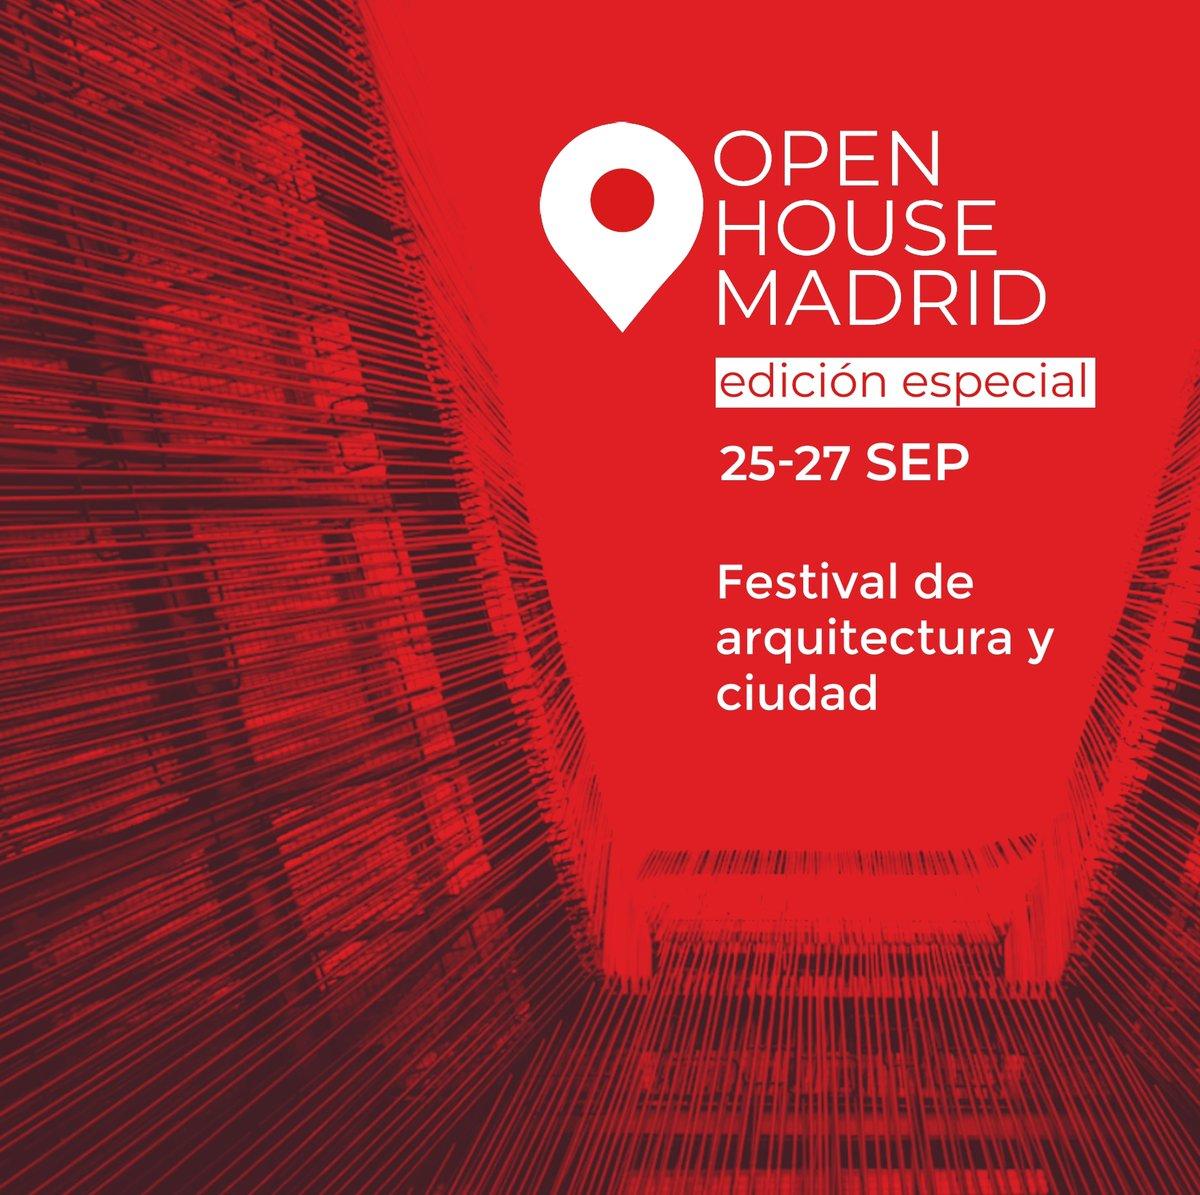 Foto cedida por Open House Madrid